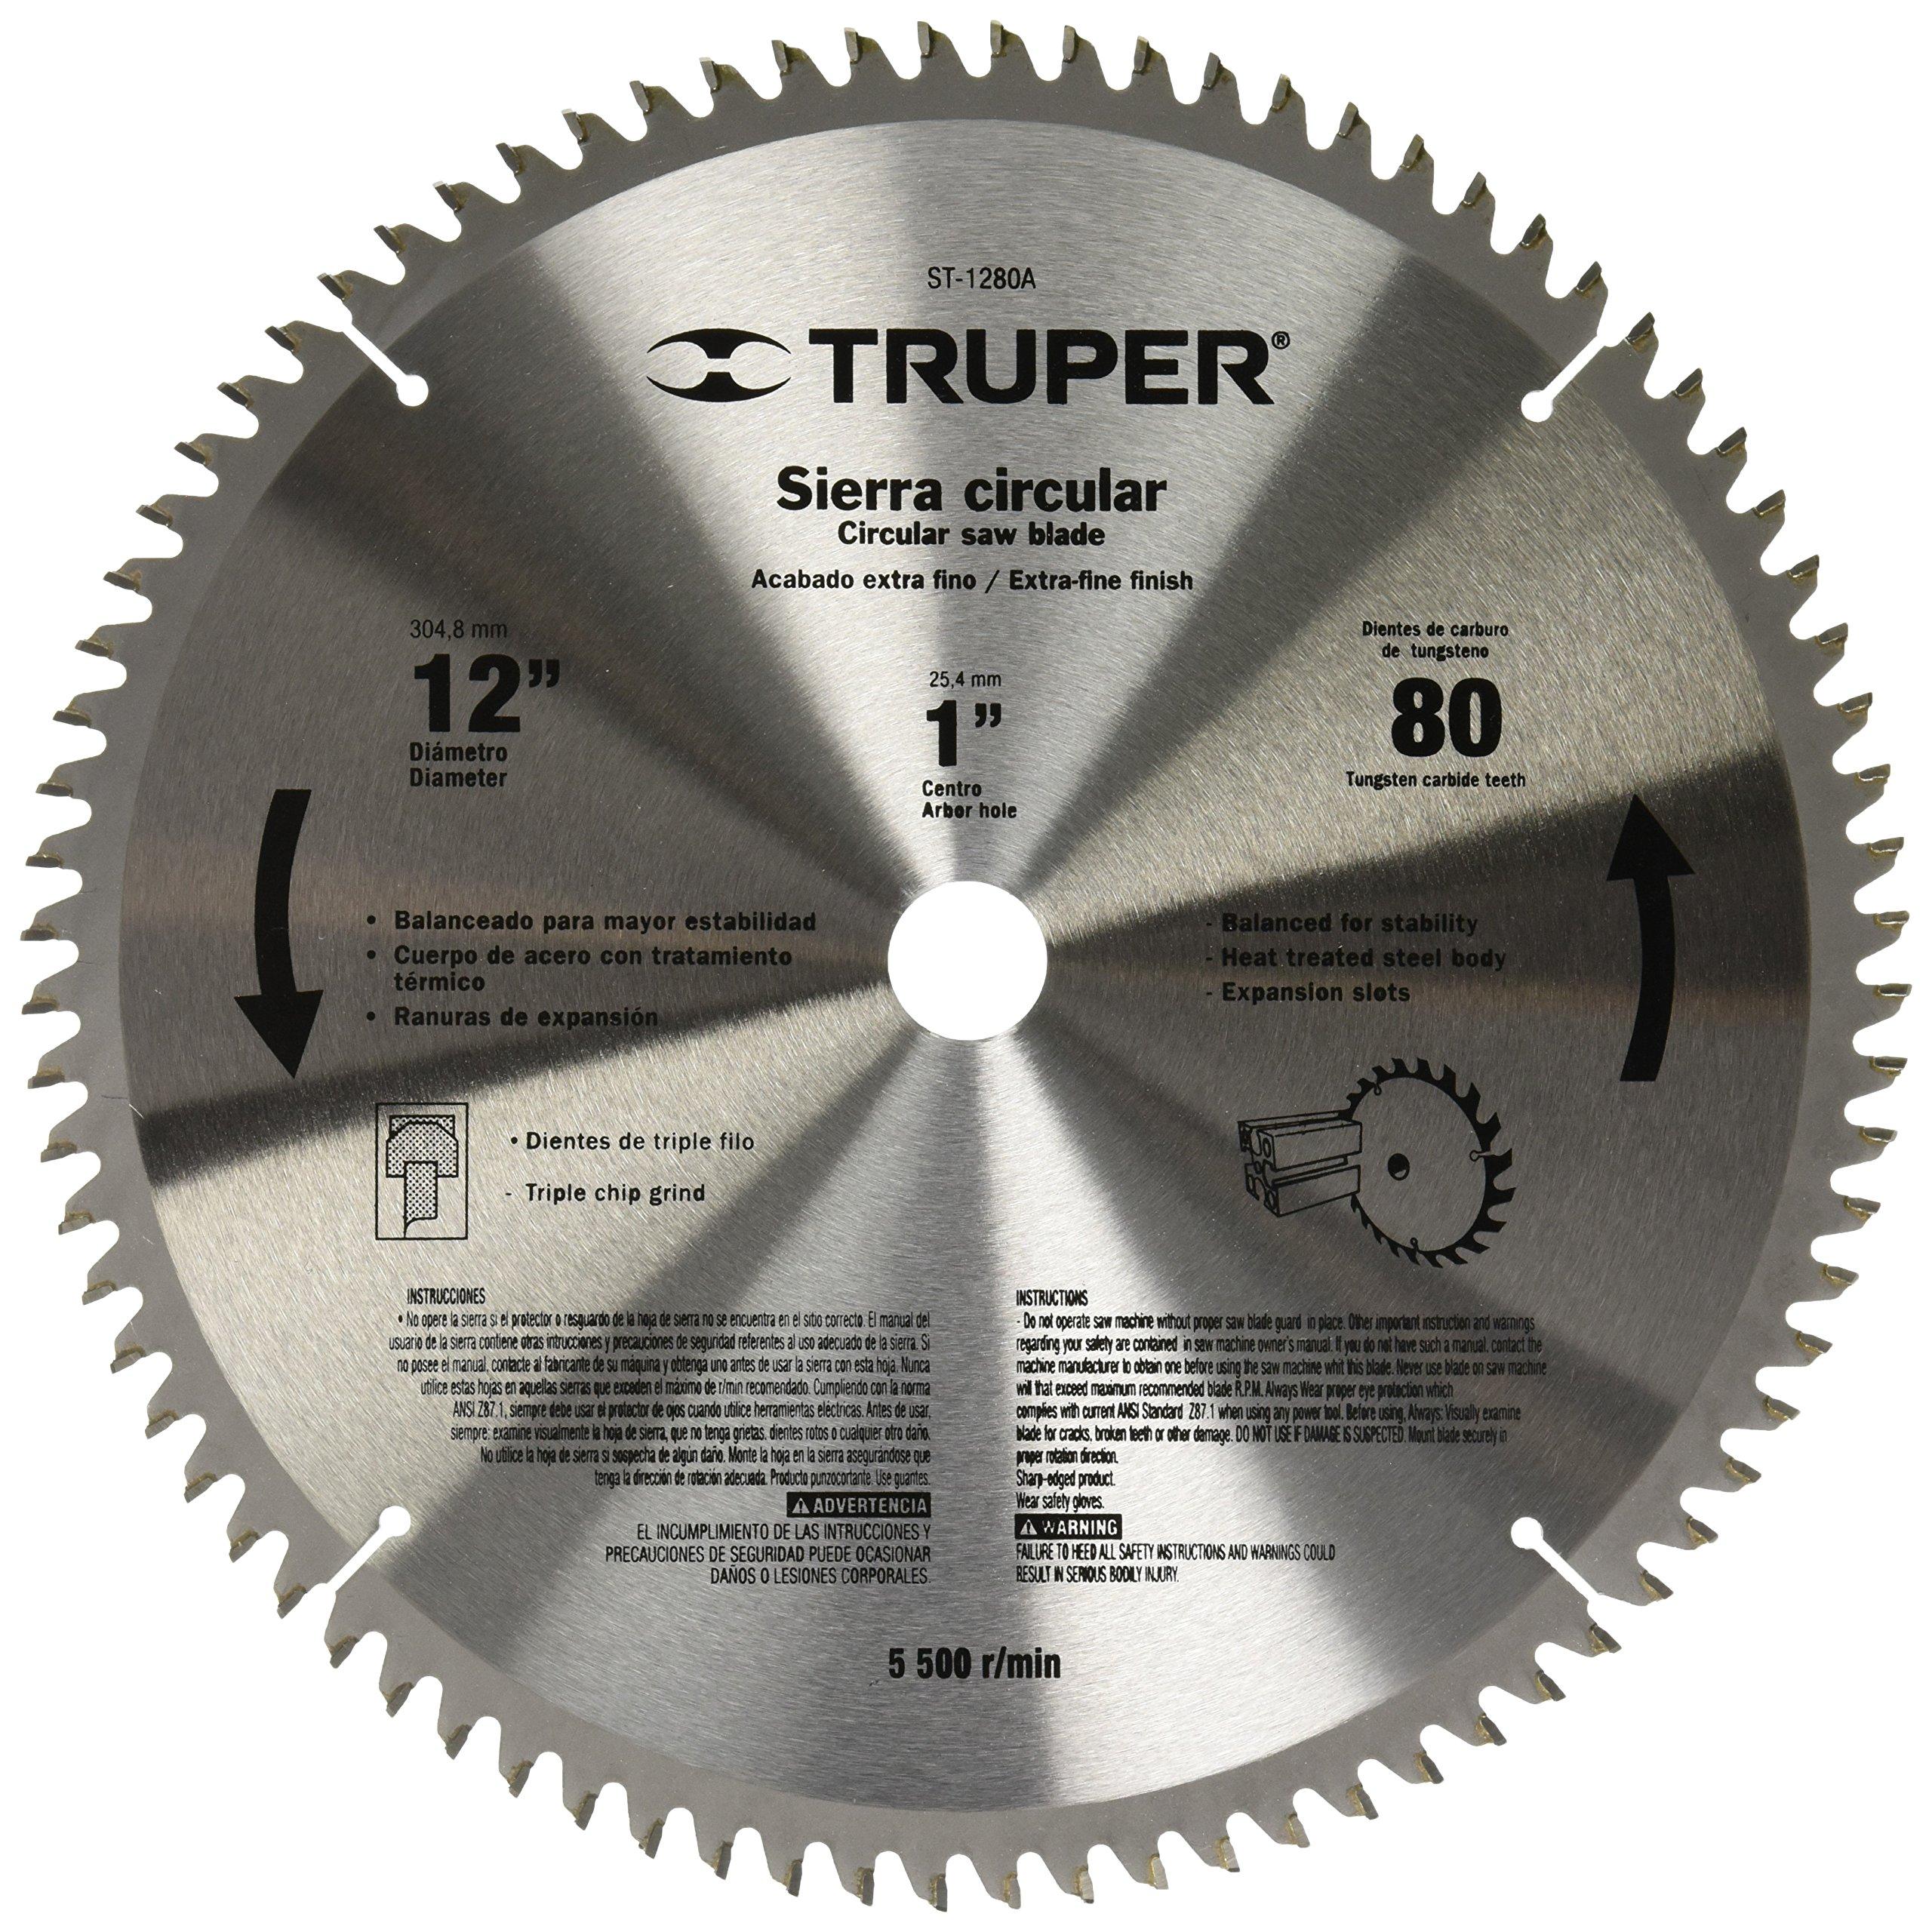 TRUPER ST-1280A 12'' Aluminum Cutting Saw Blade, 80 teeth, center 1